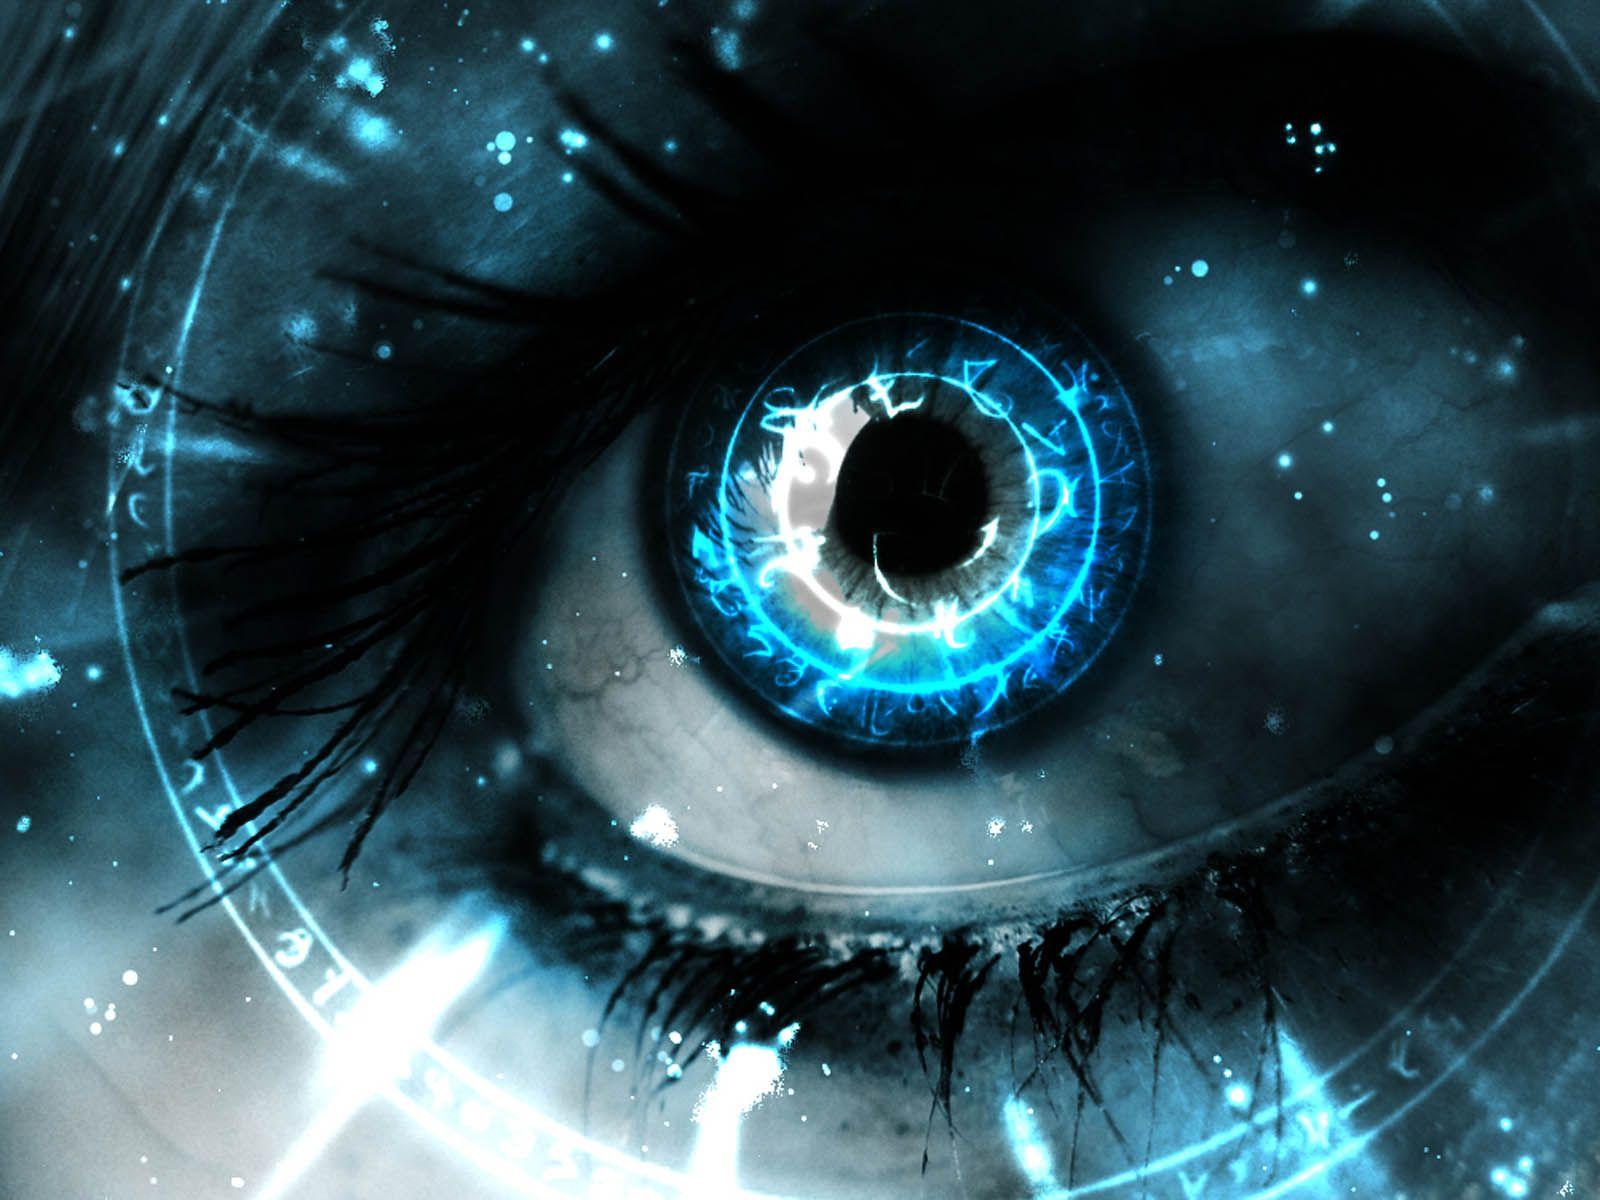 Artistic Eye Wallpaper Eyes Wallpaper Magic Eyes Eye Art